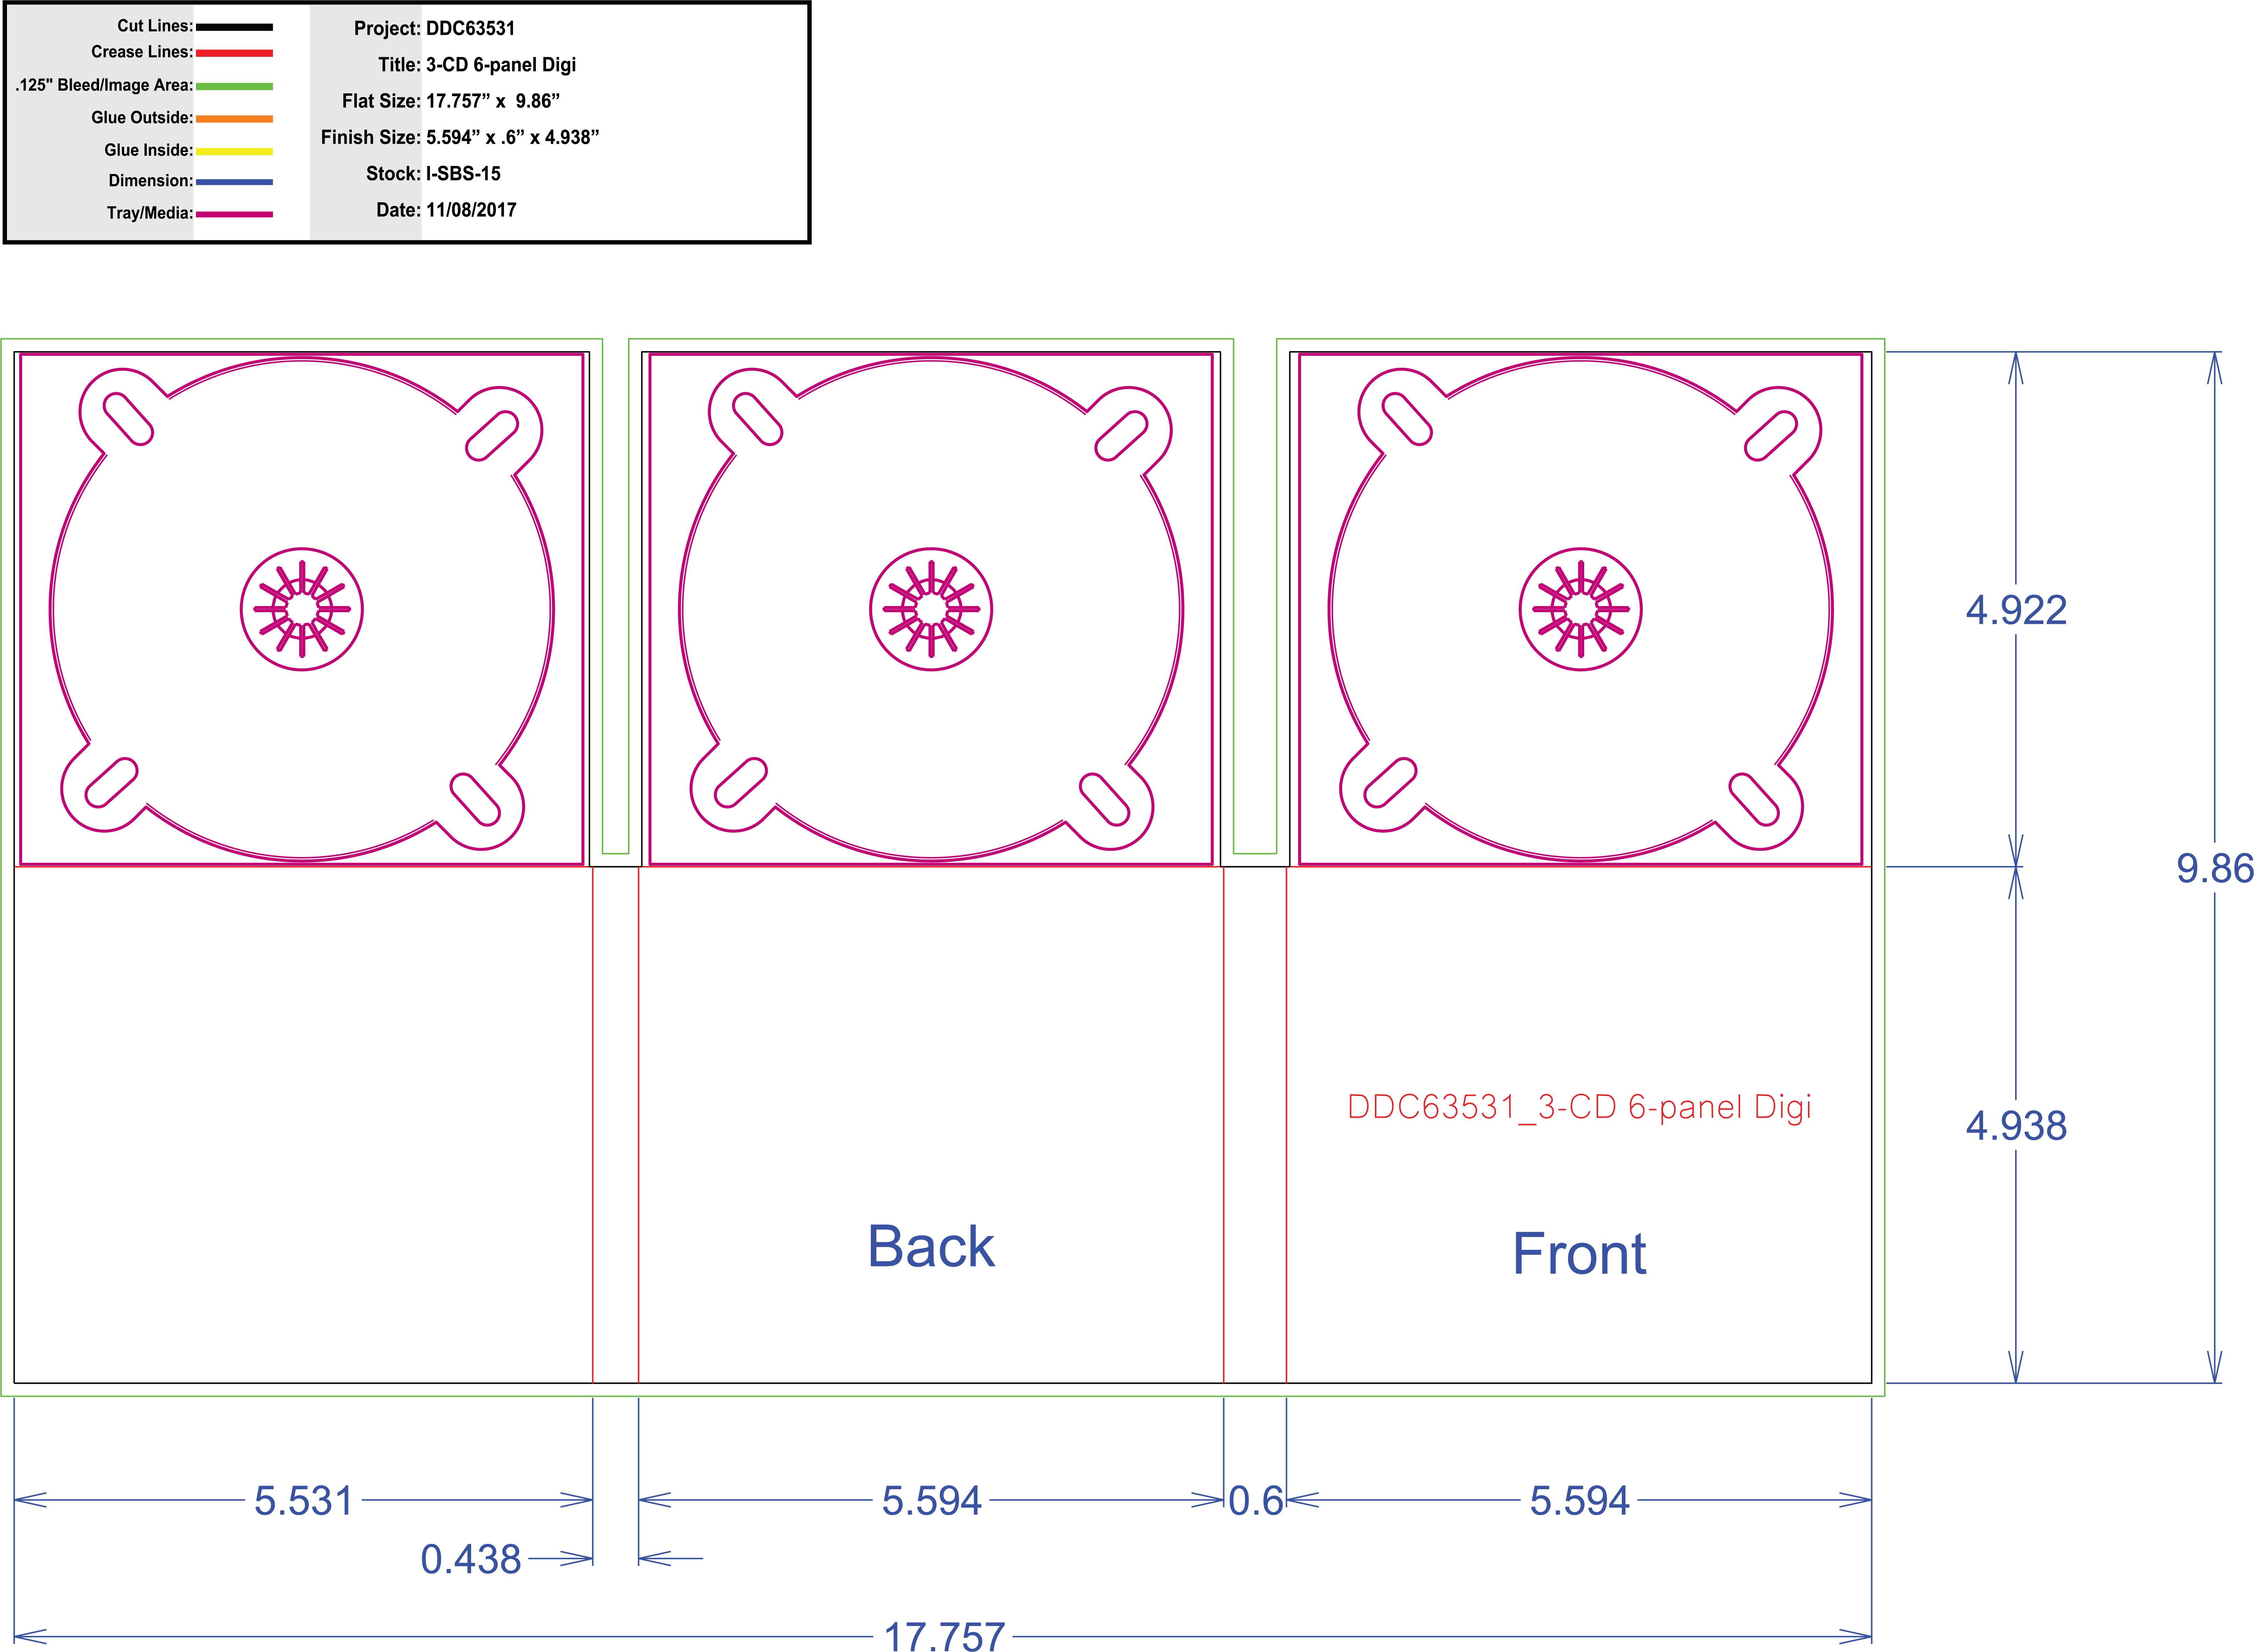 DDC63531 6 Panel Digi 3 Tray, No Pocket